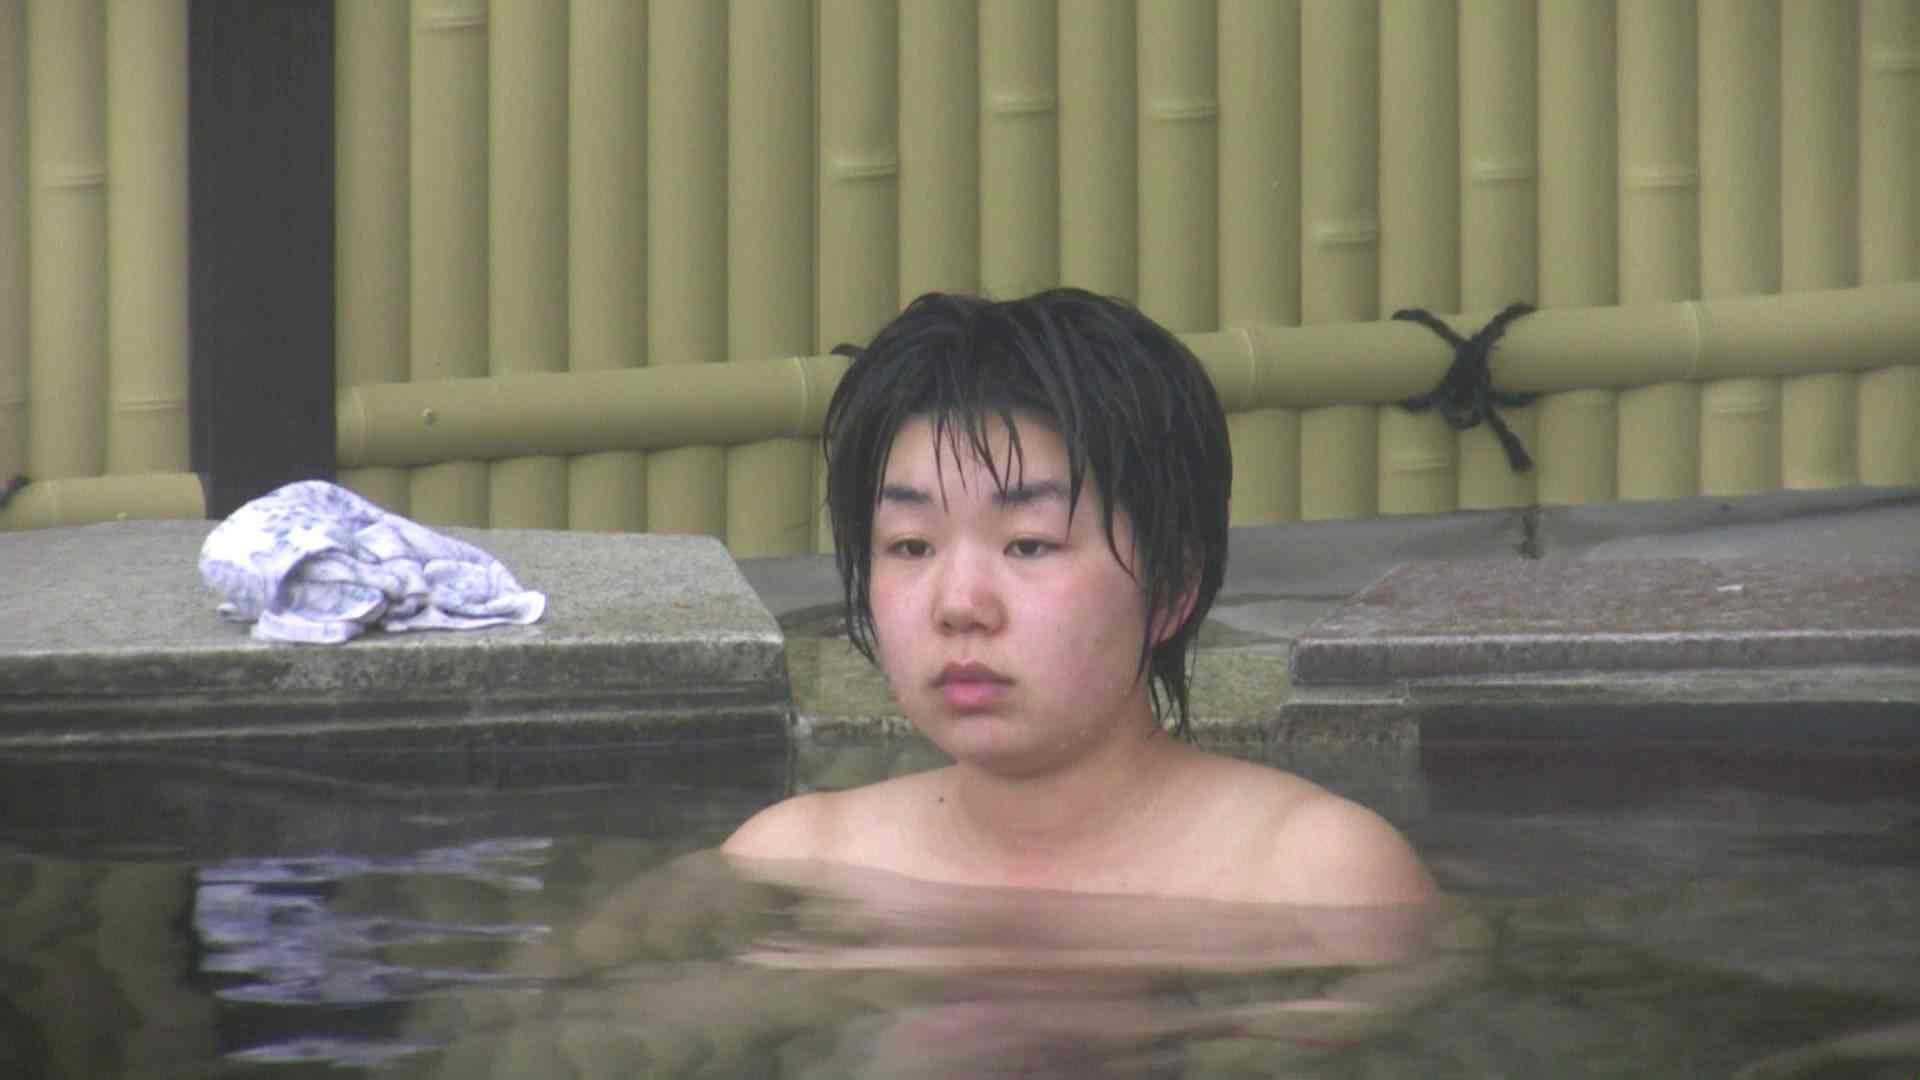 Aquaな露天風呂Vol.53【VIP限定】 盗撮師作品 おまんこ動画流出 78pic 14